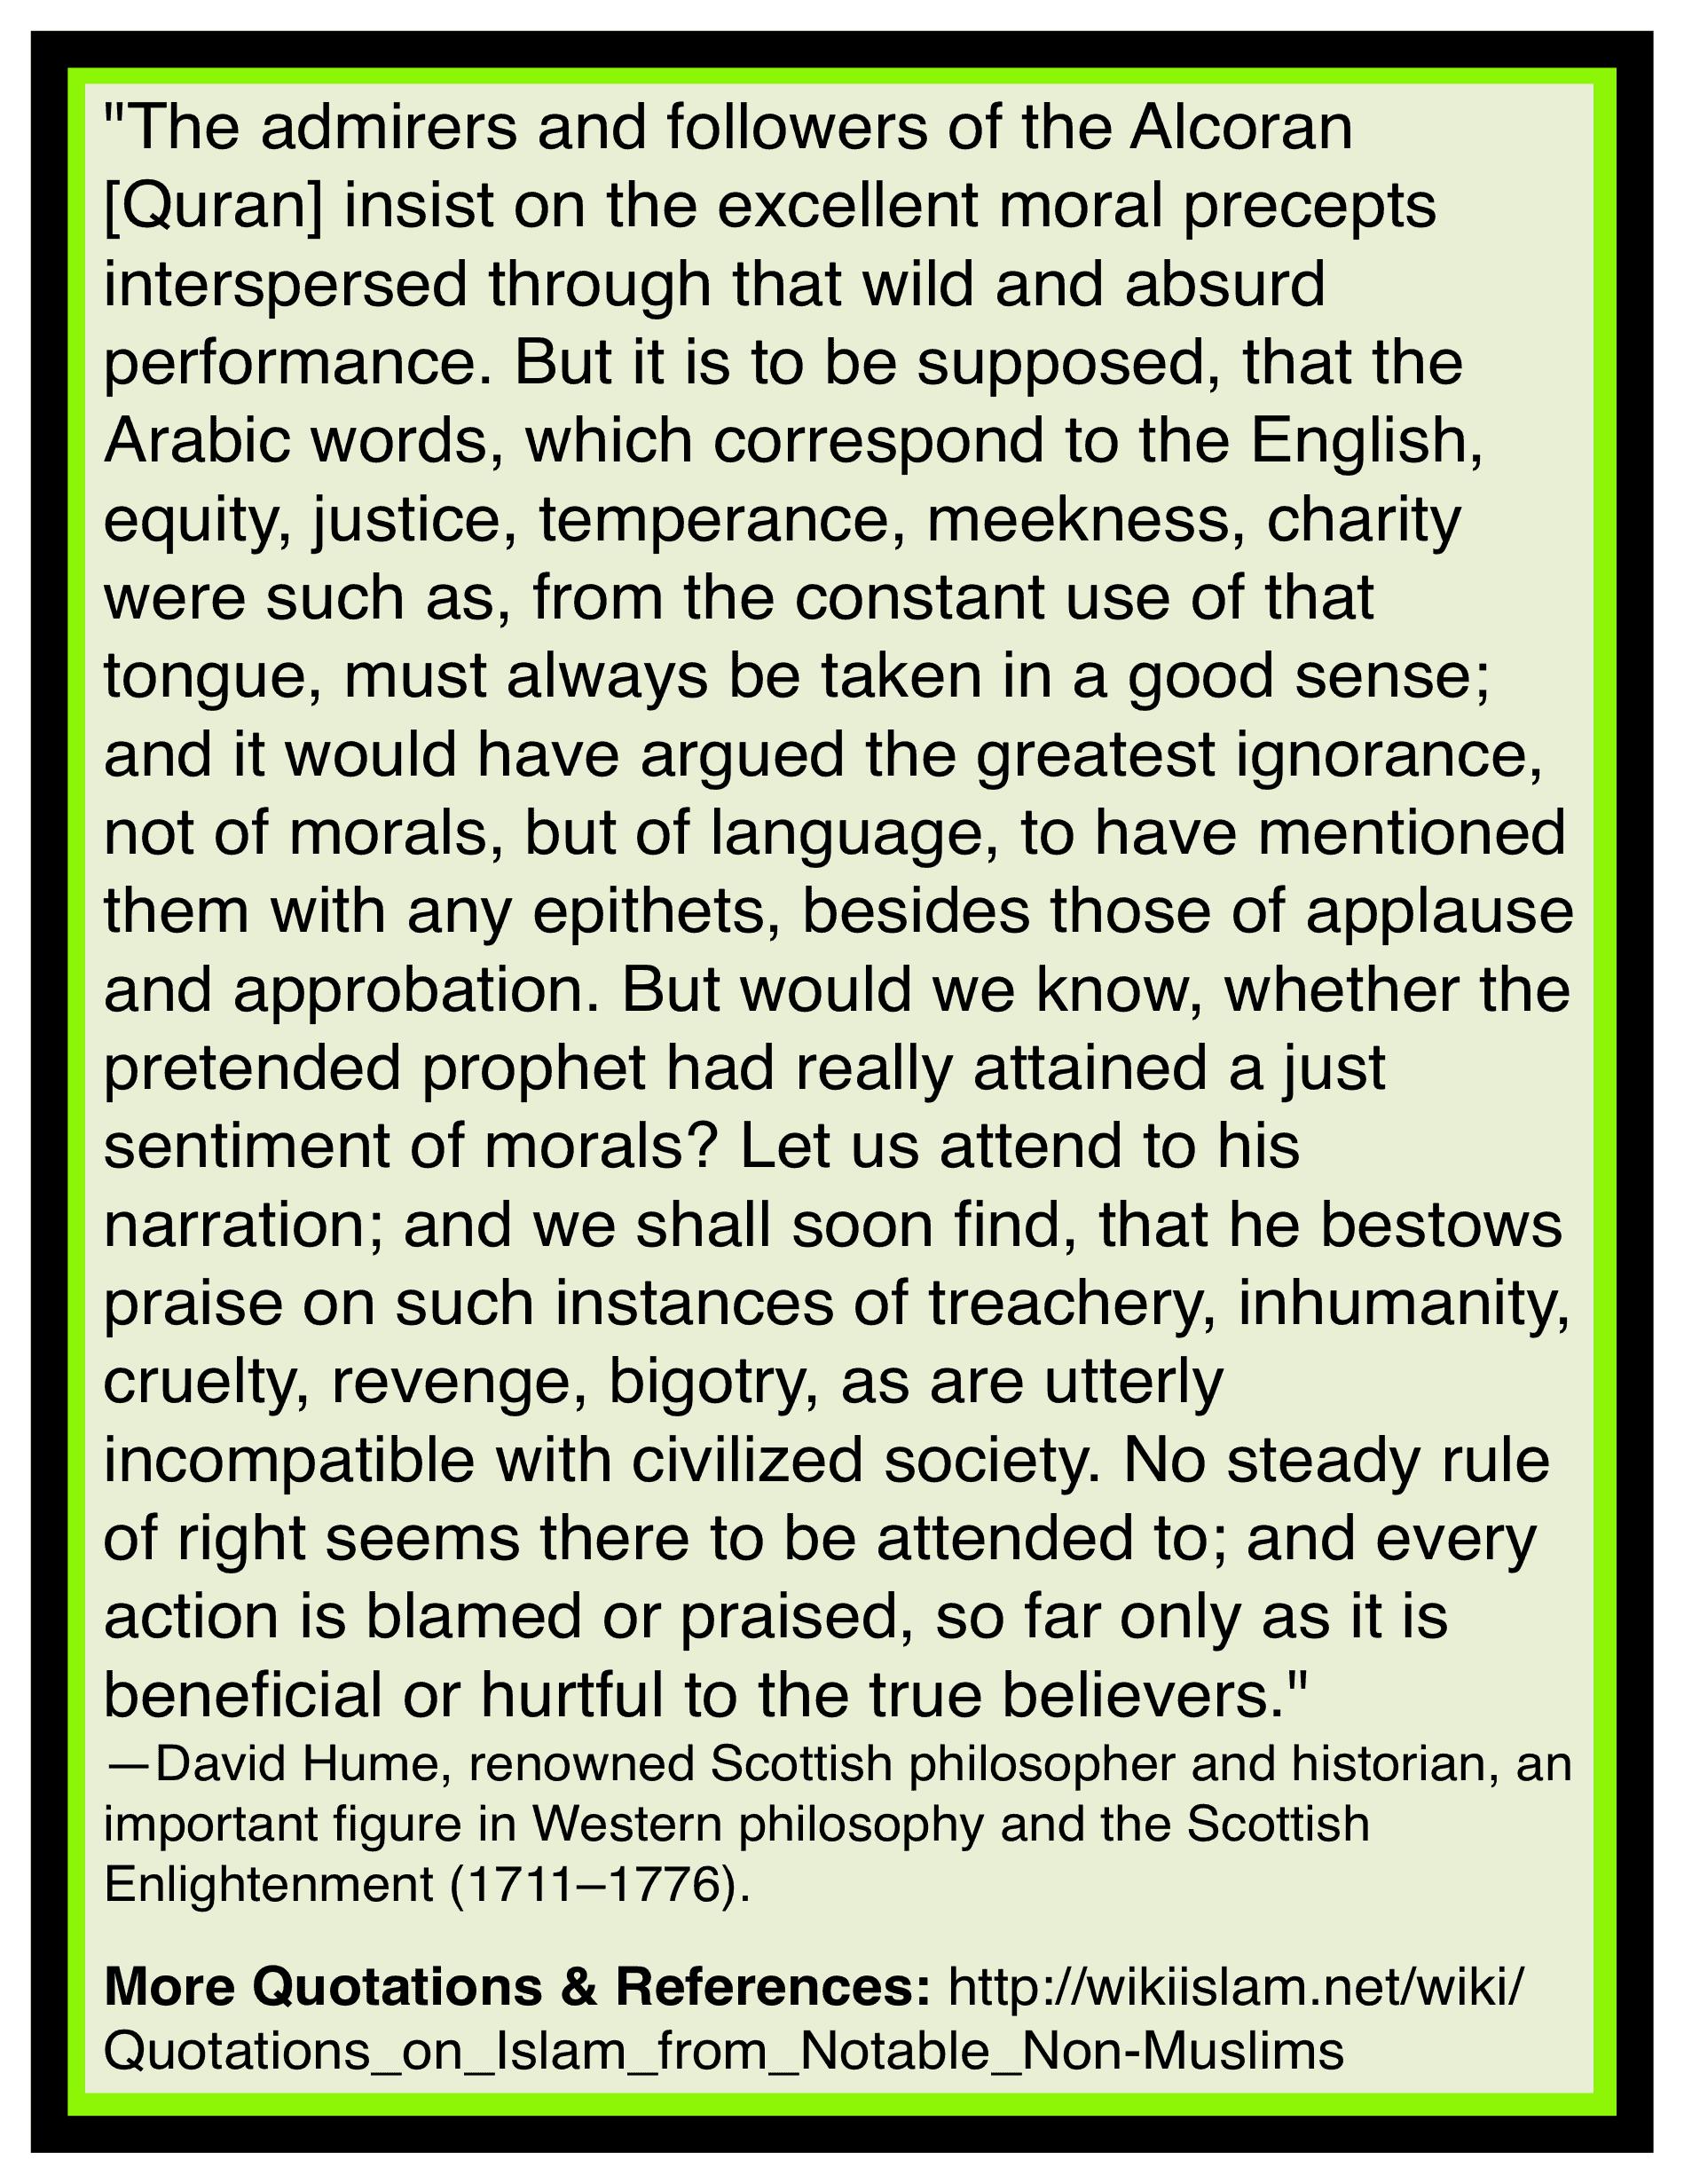 Muhammad taught immorality